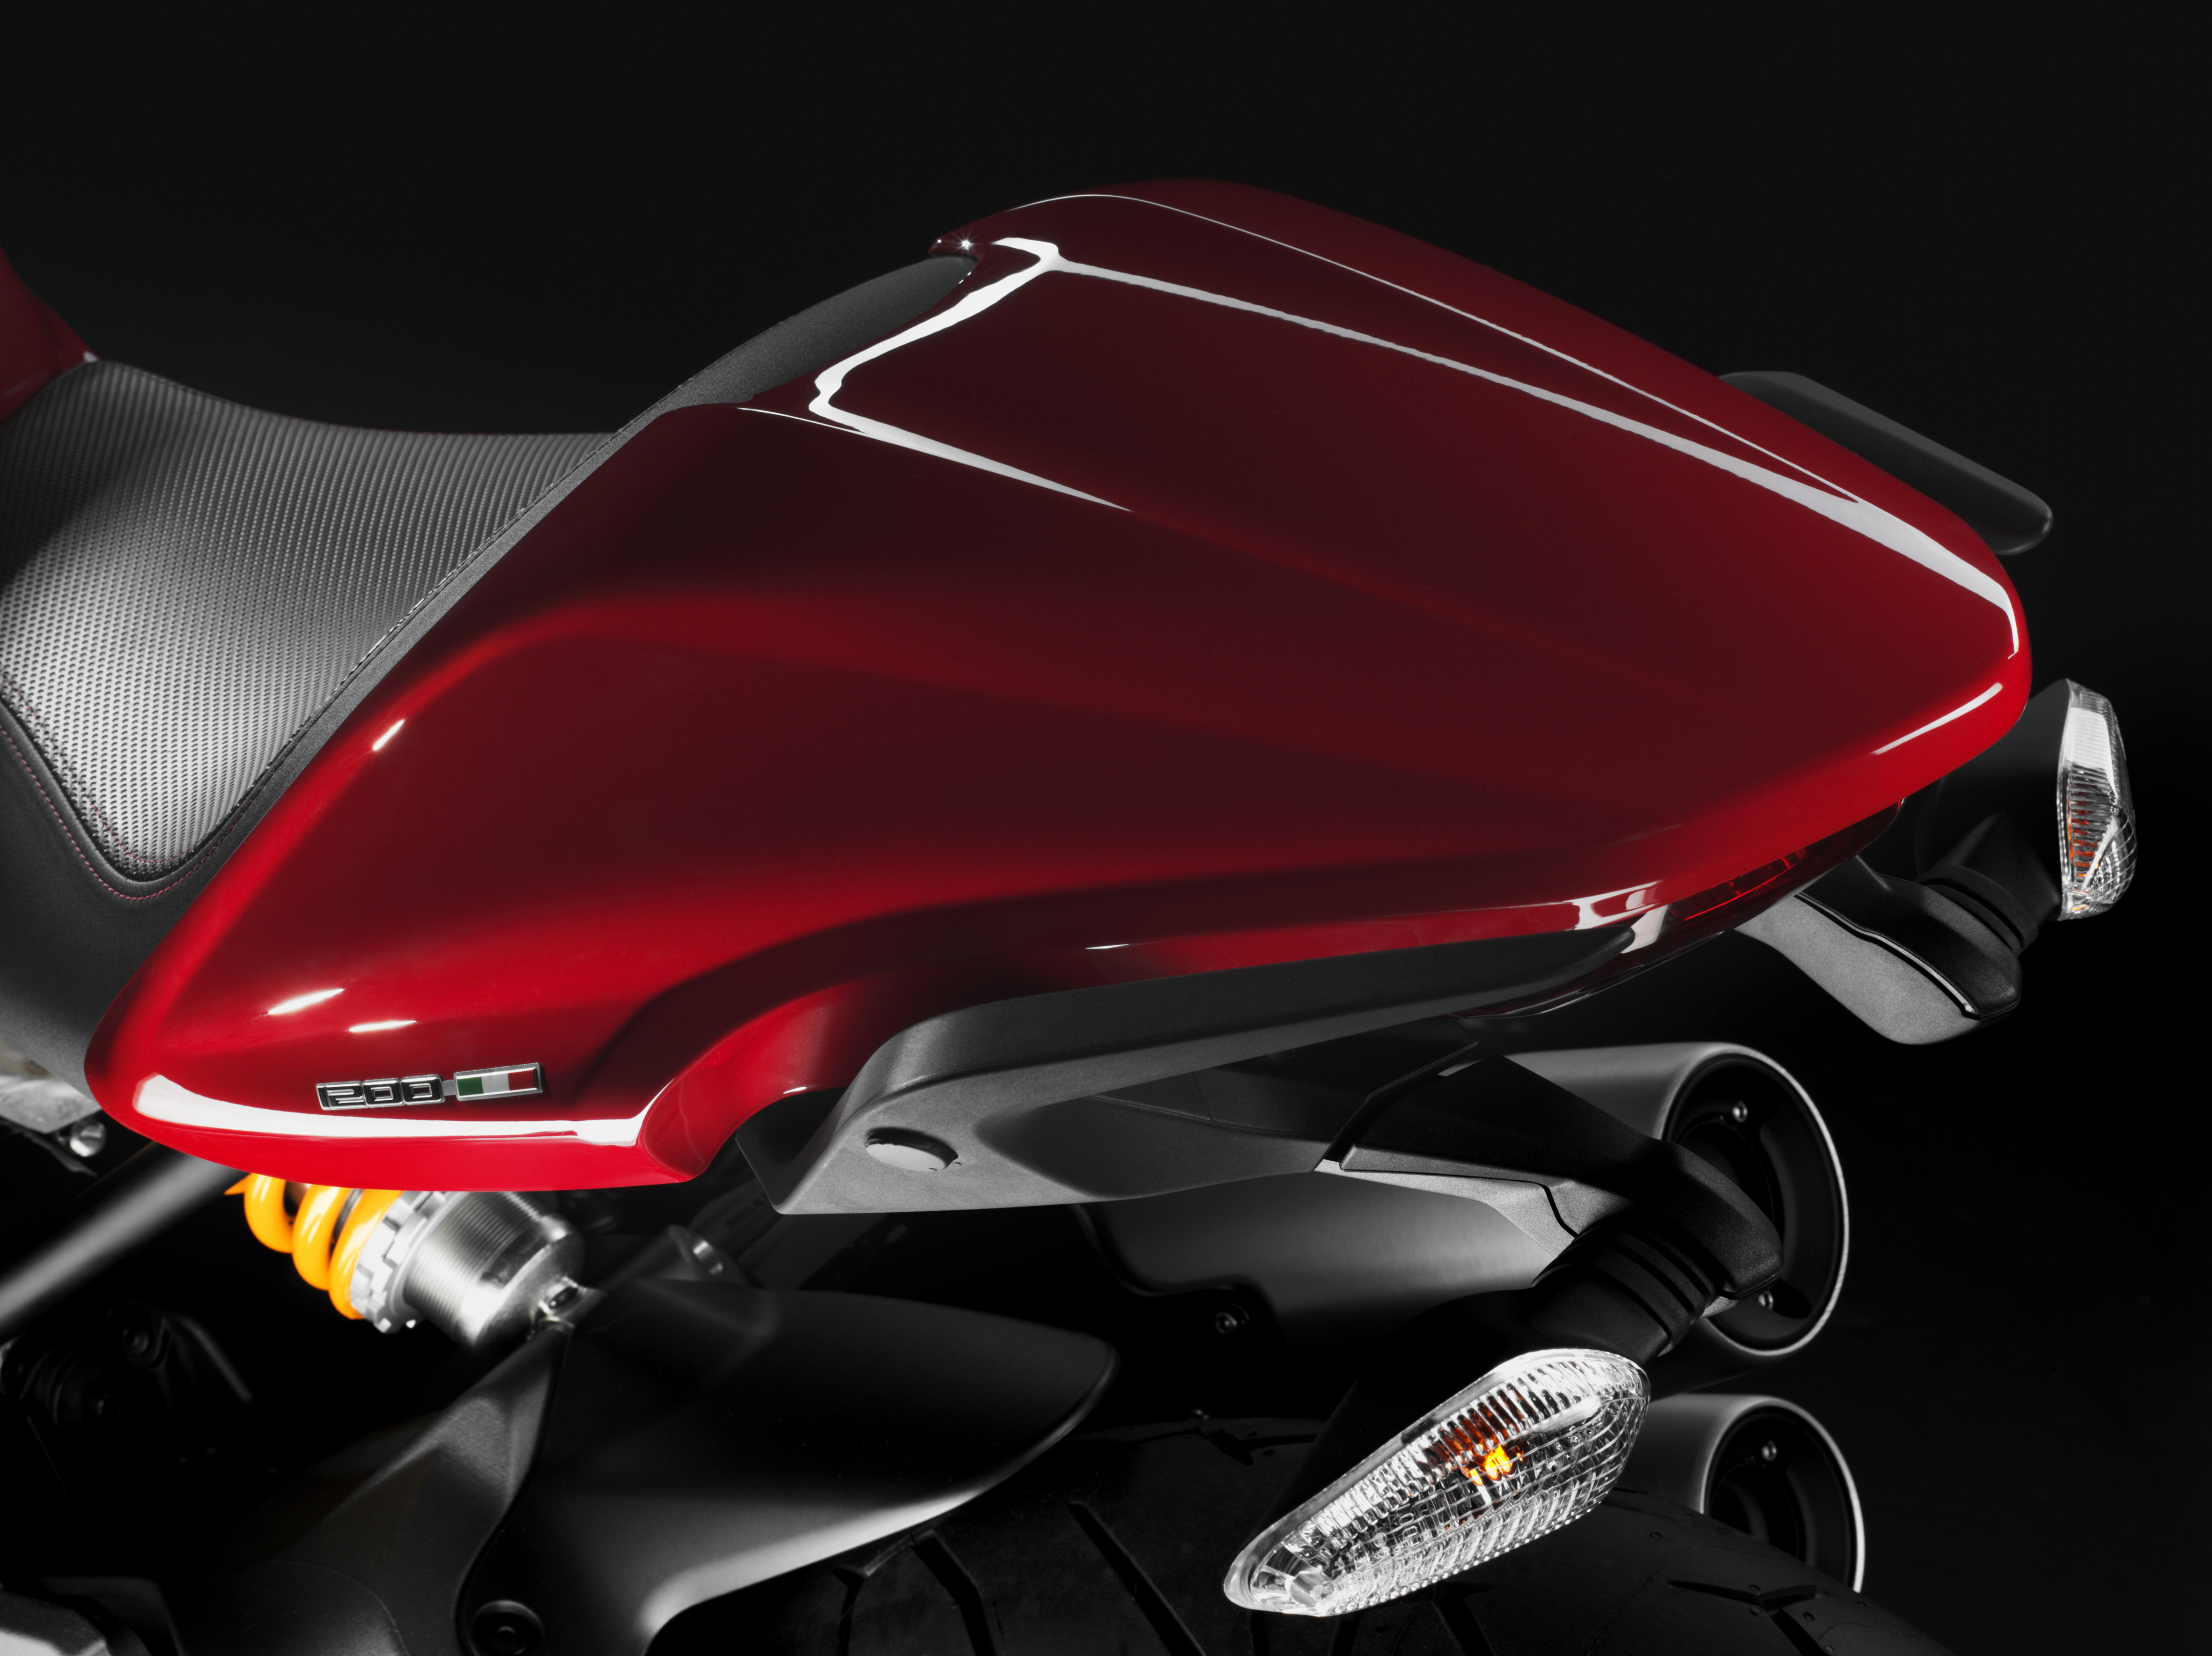 First Ride Ducati Monster 1200s Review Visordown